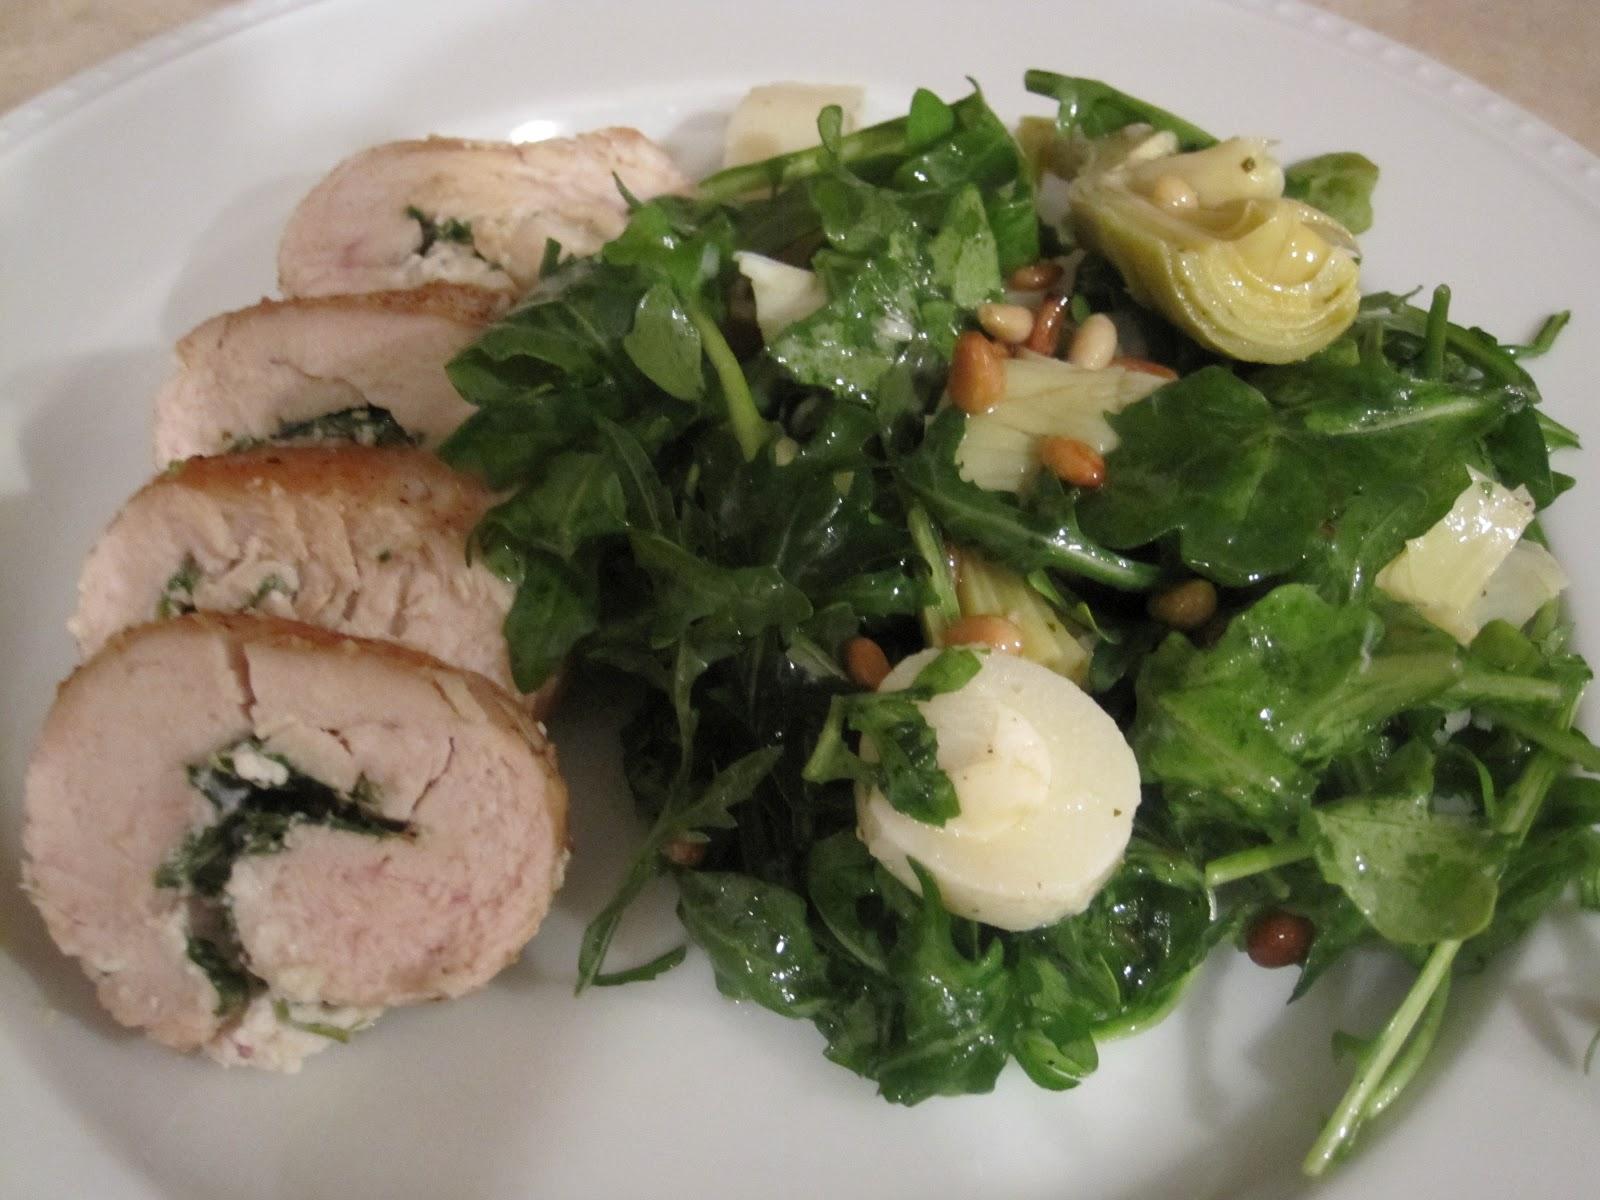 diet schmiet!: Chicken with Goat Cheese and Arugula